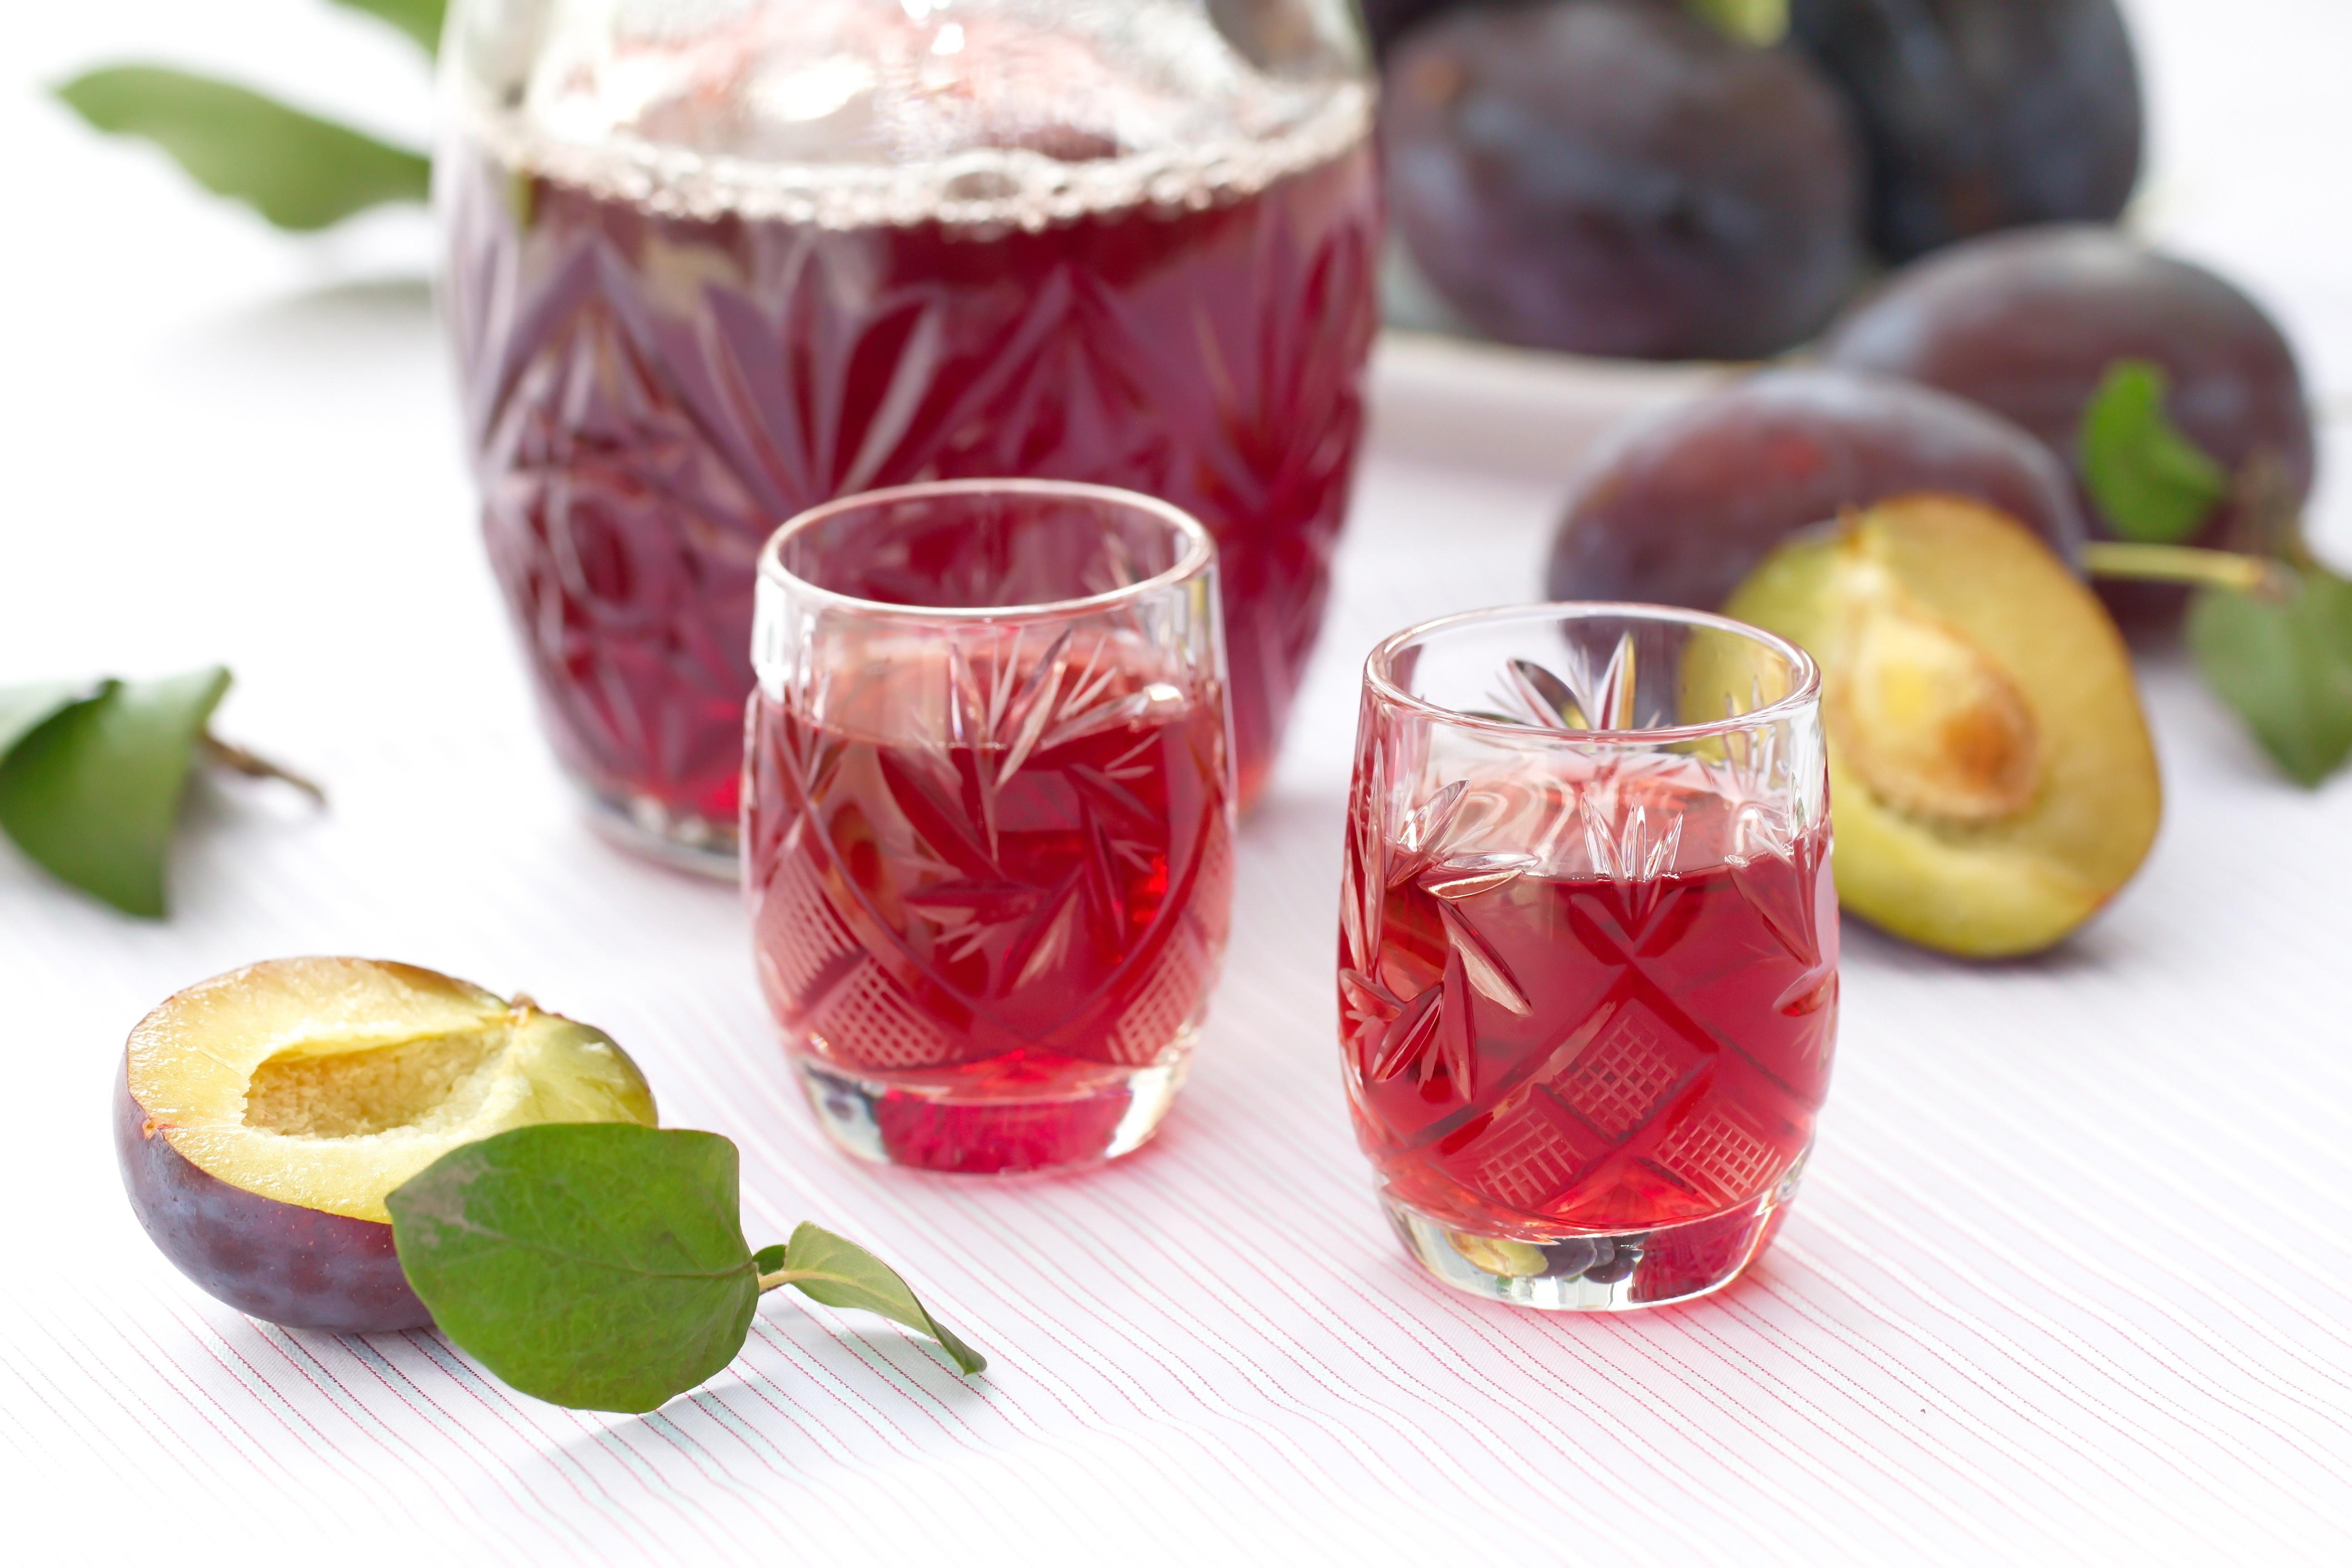 Glass of Damson Vodka